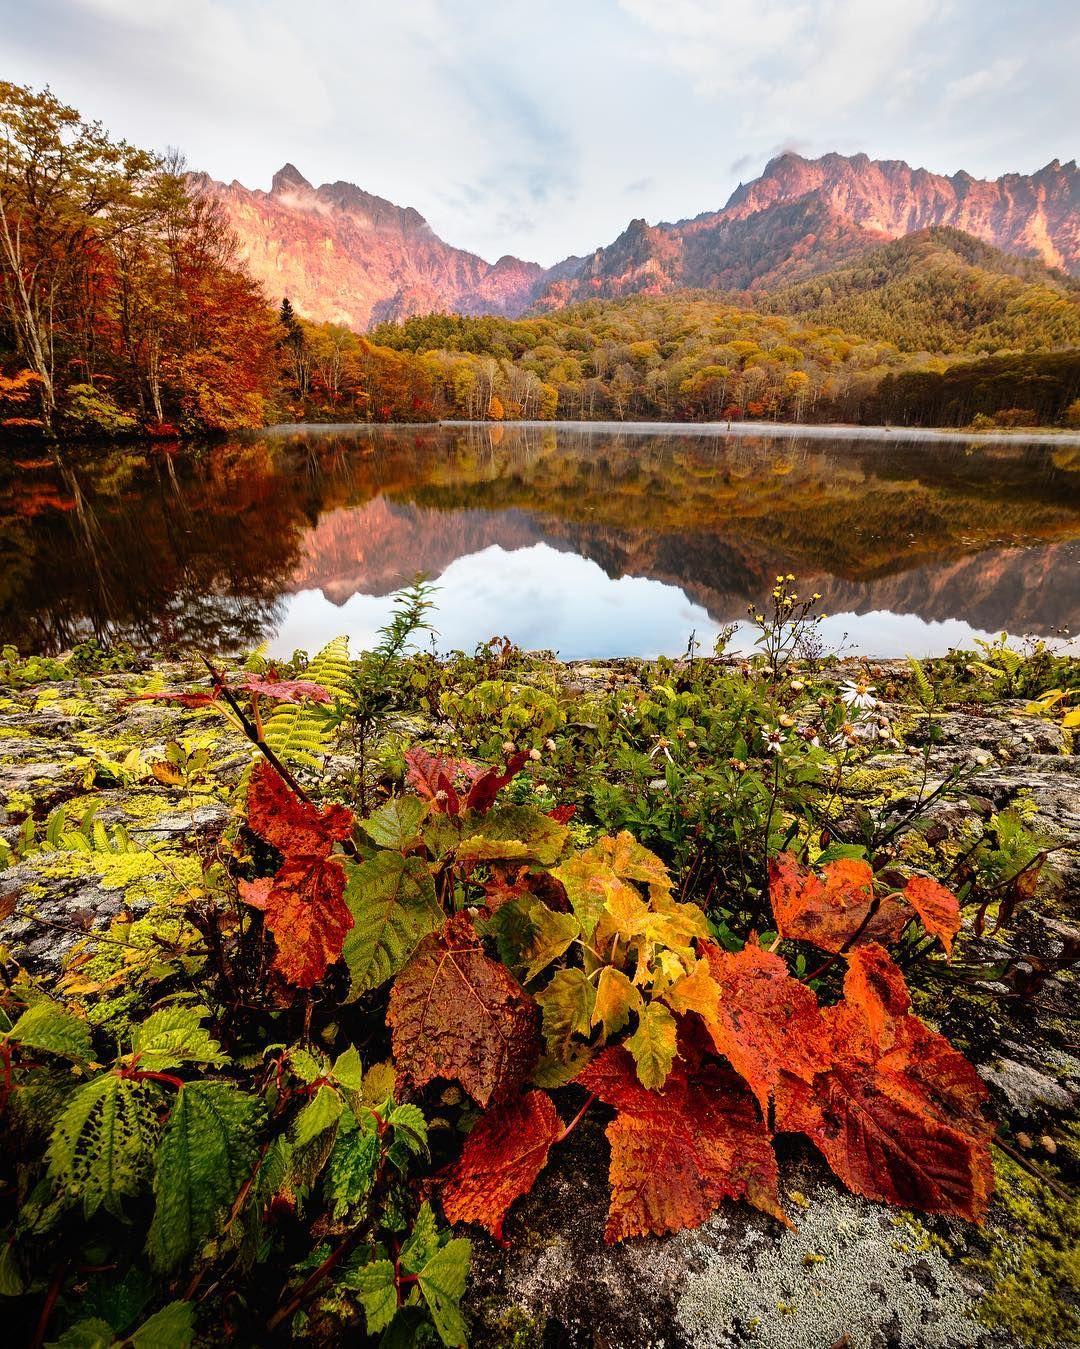 Colorful Autumn In Japan Landscape Photography By Daisuke Uematsu Amazing Nature Photography Landscape Photography Tutorial Landscape Photography